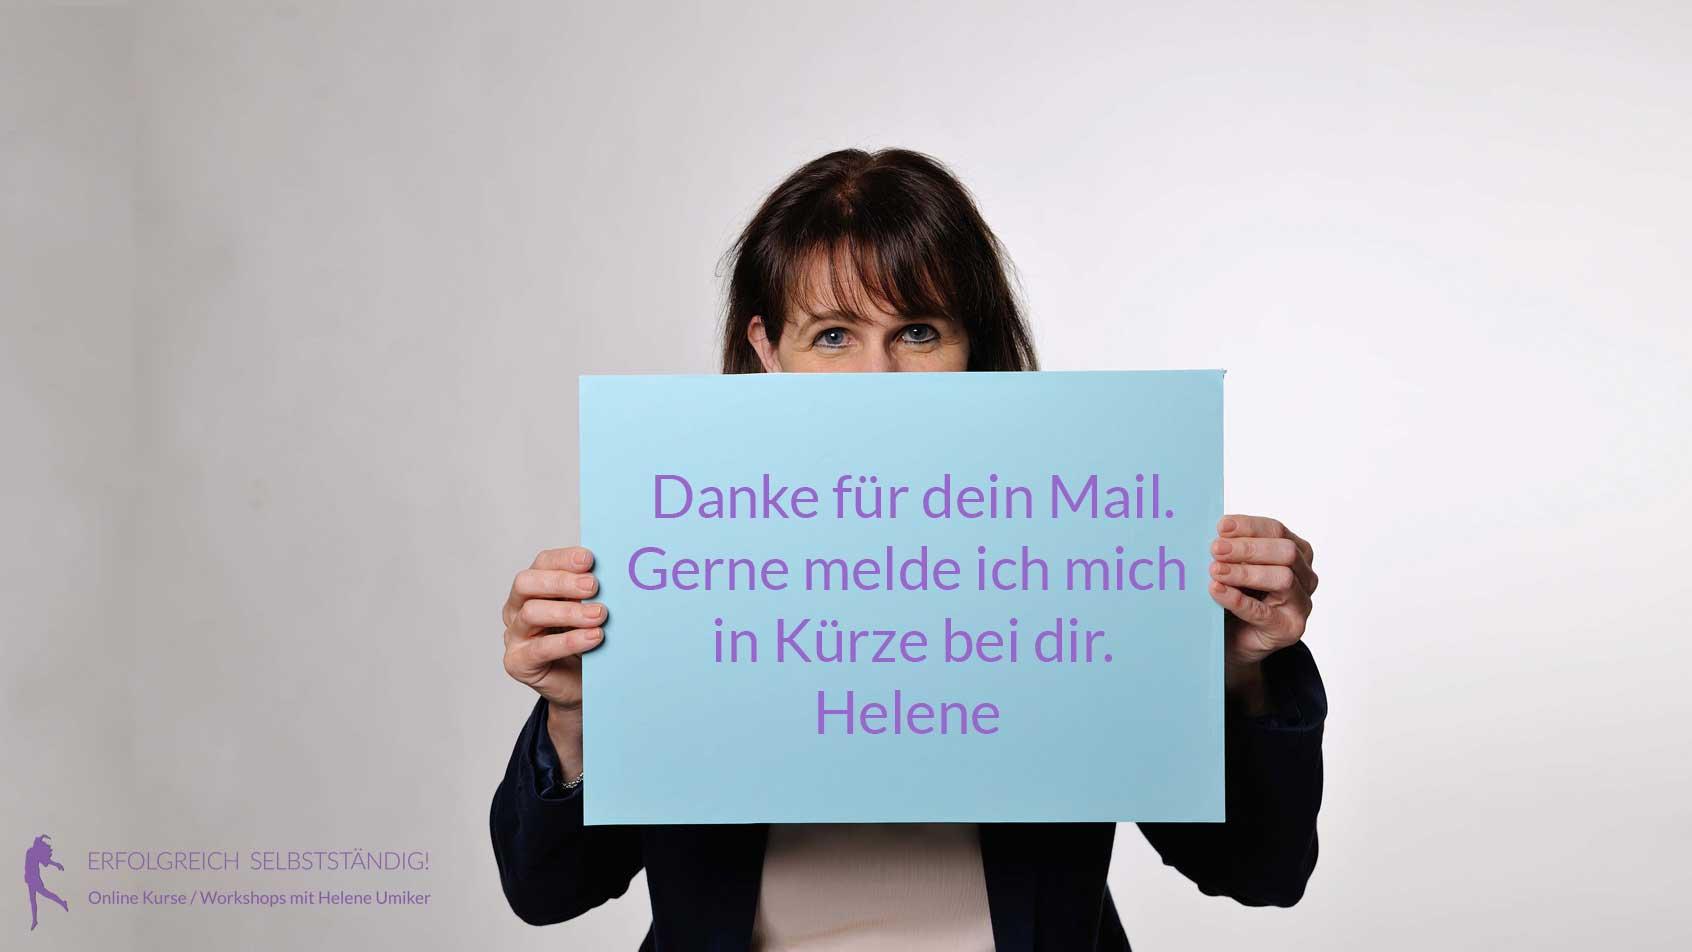 Erfolgreich_selbststaendig-mit_Helene_Umiker-danke